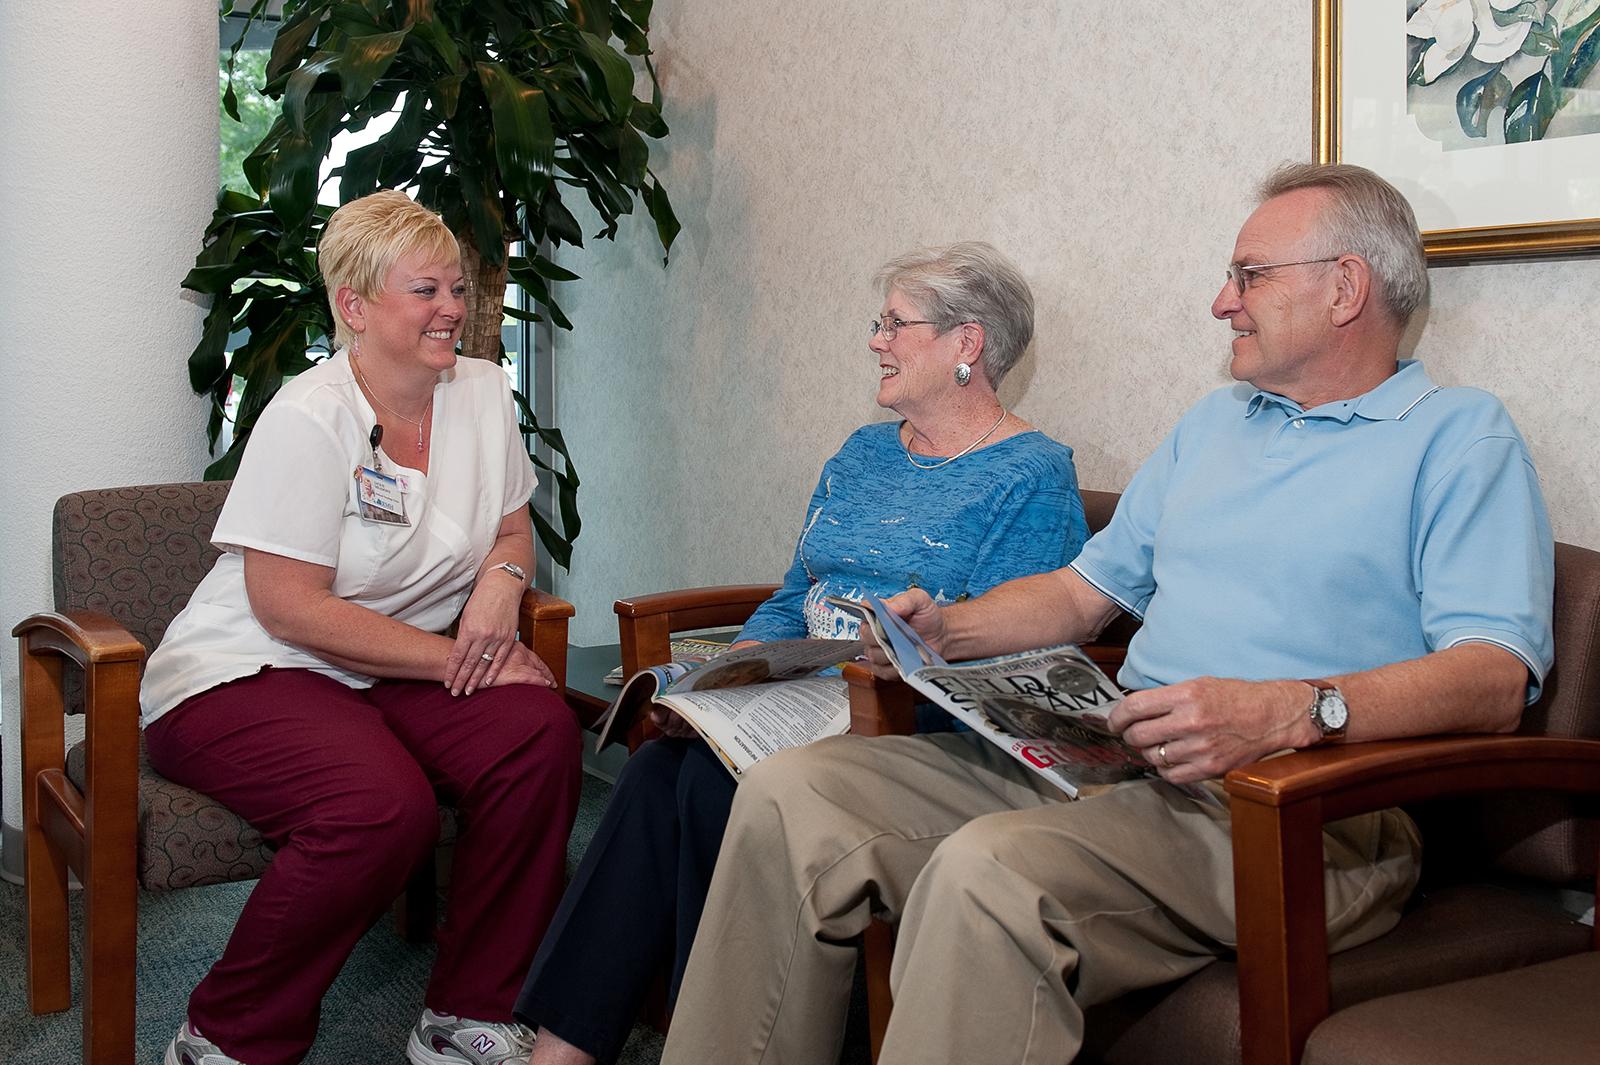 Virginia Healthcare Photographer 0033